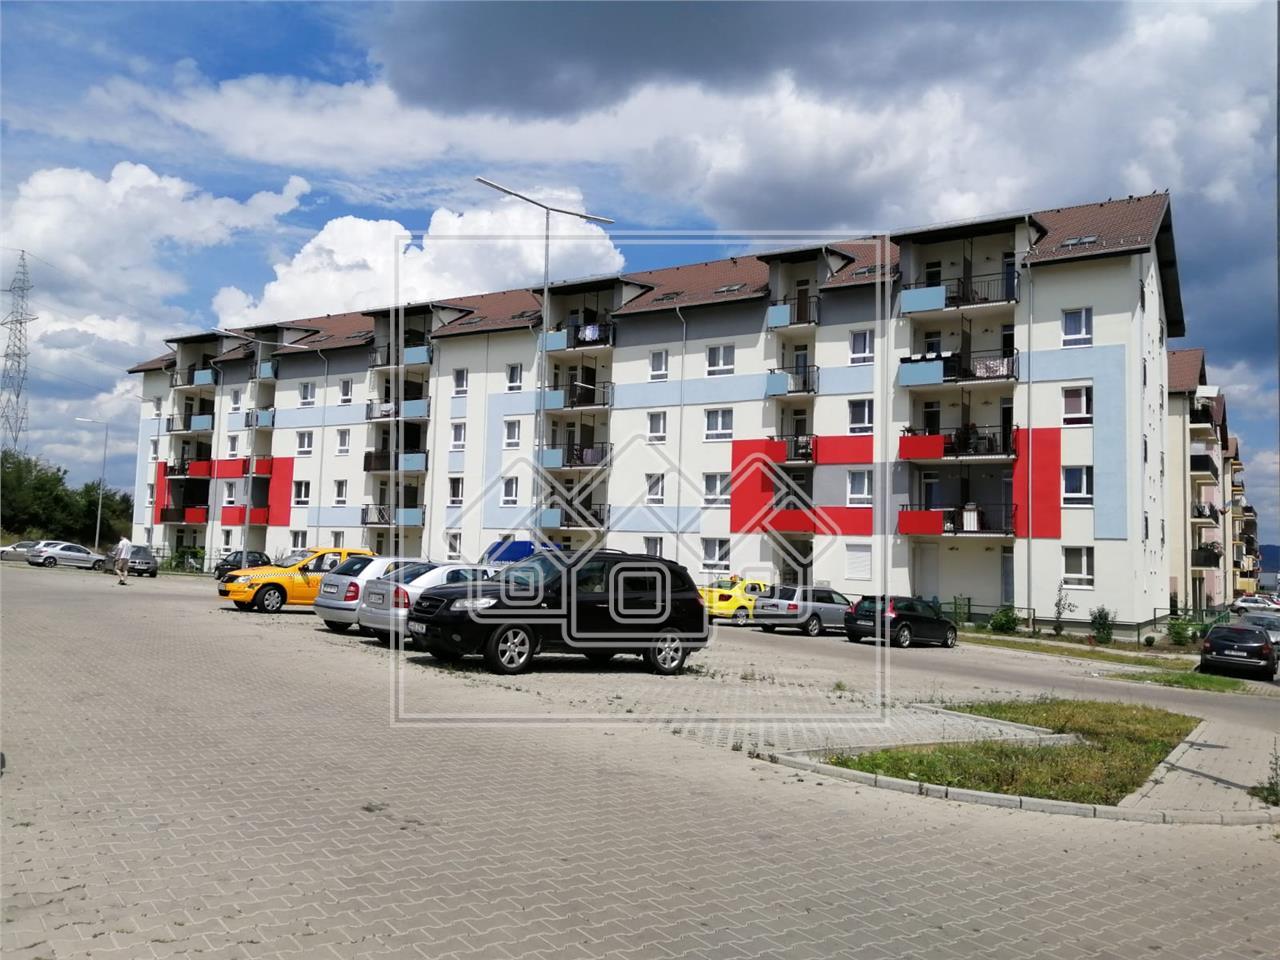 Garsoniera de inchiriat in Sibiu -total decomandata-cu balcon